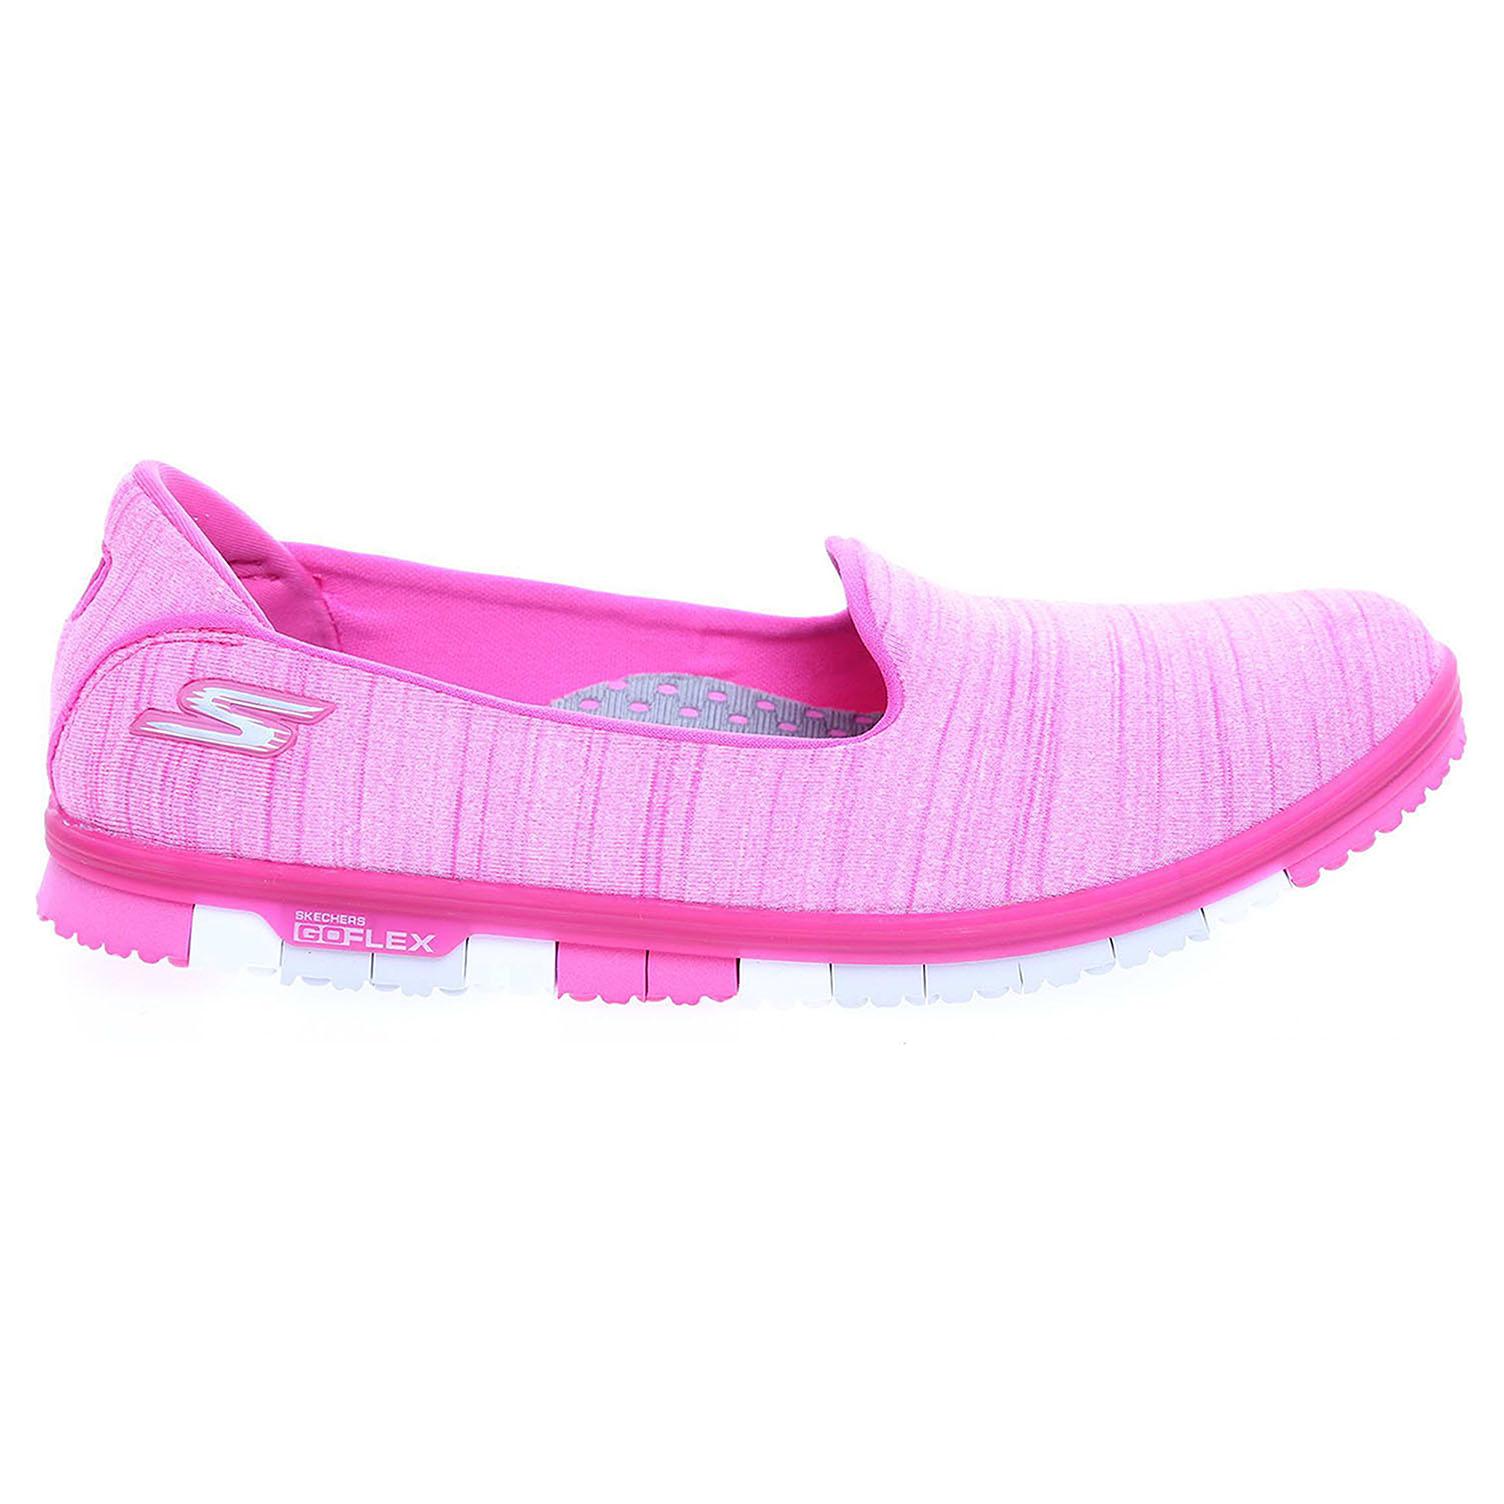 Skechers Go Mini Flex hot pink 36